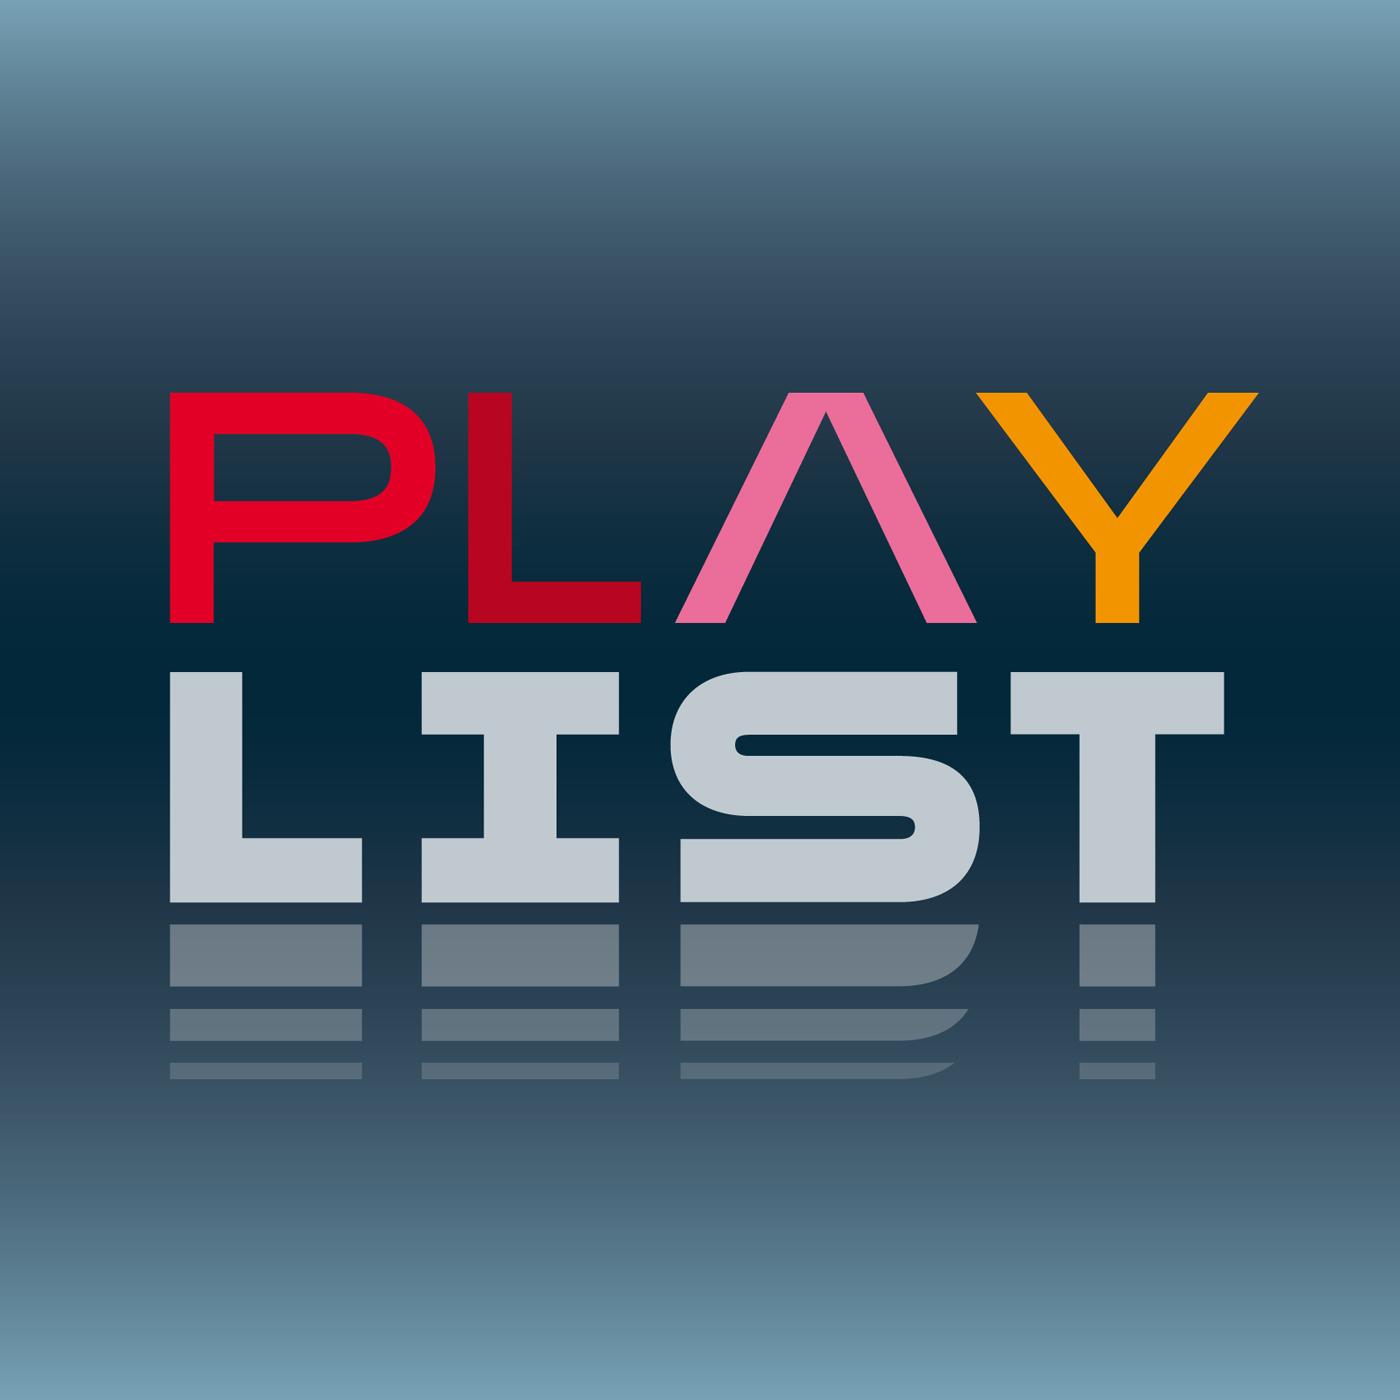 Playlist 1400x1400 [RTS]